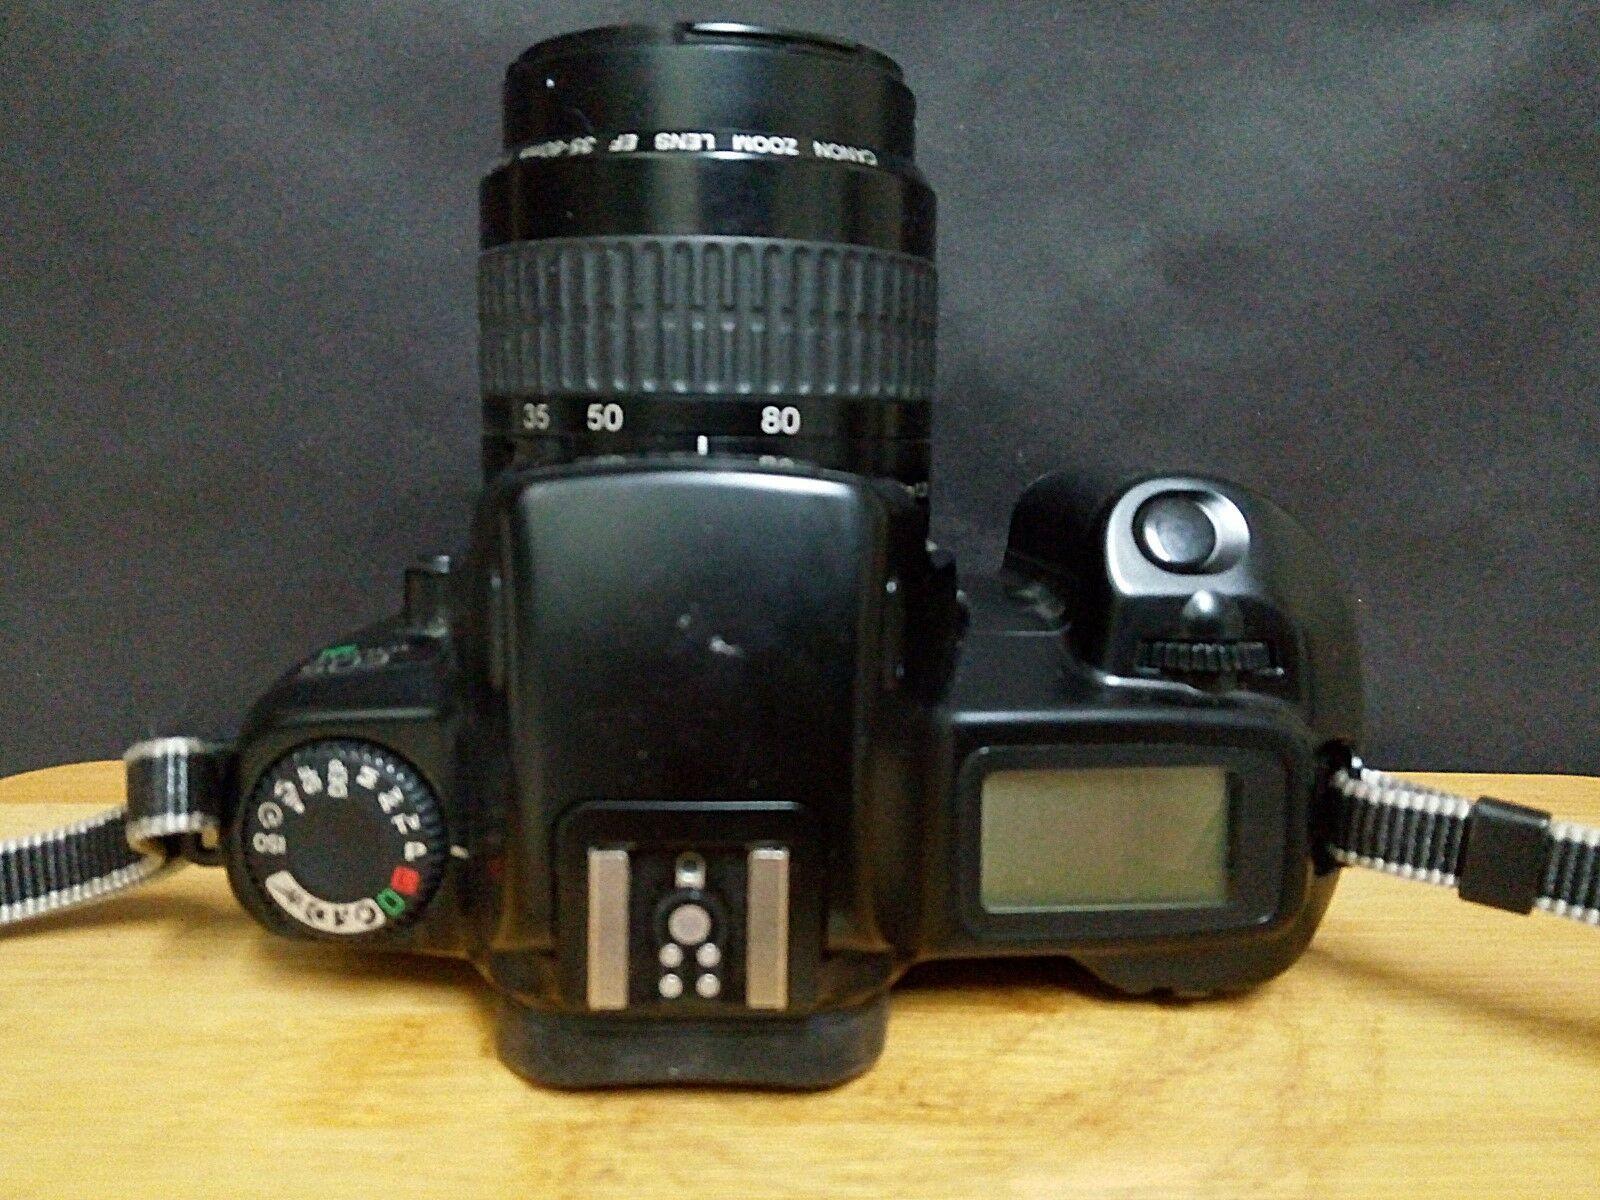 CANON EOS 1000F + Canon zoom lens EF 35-80mm 1:4-5.6 I